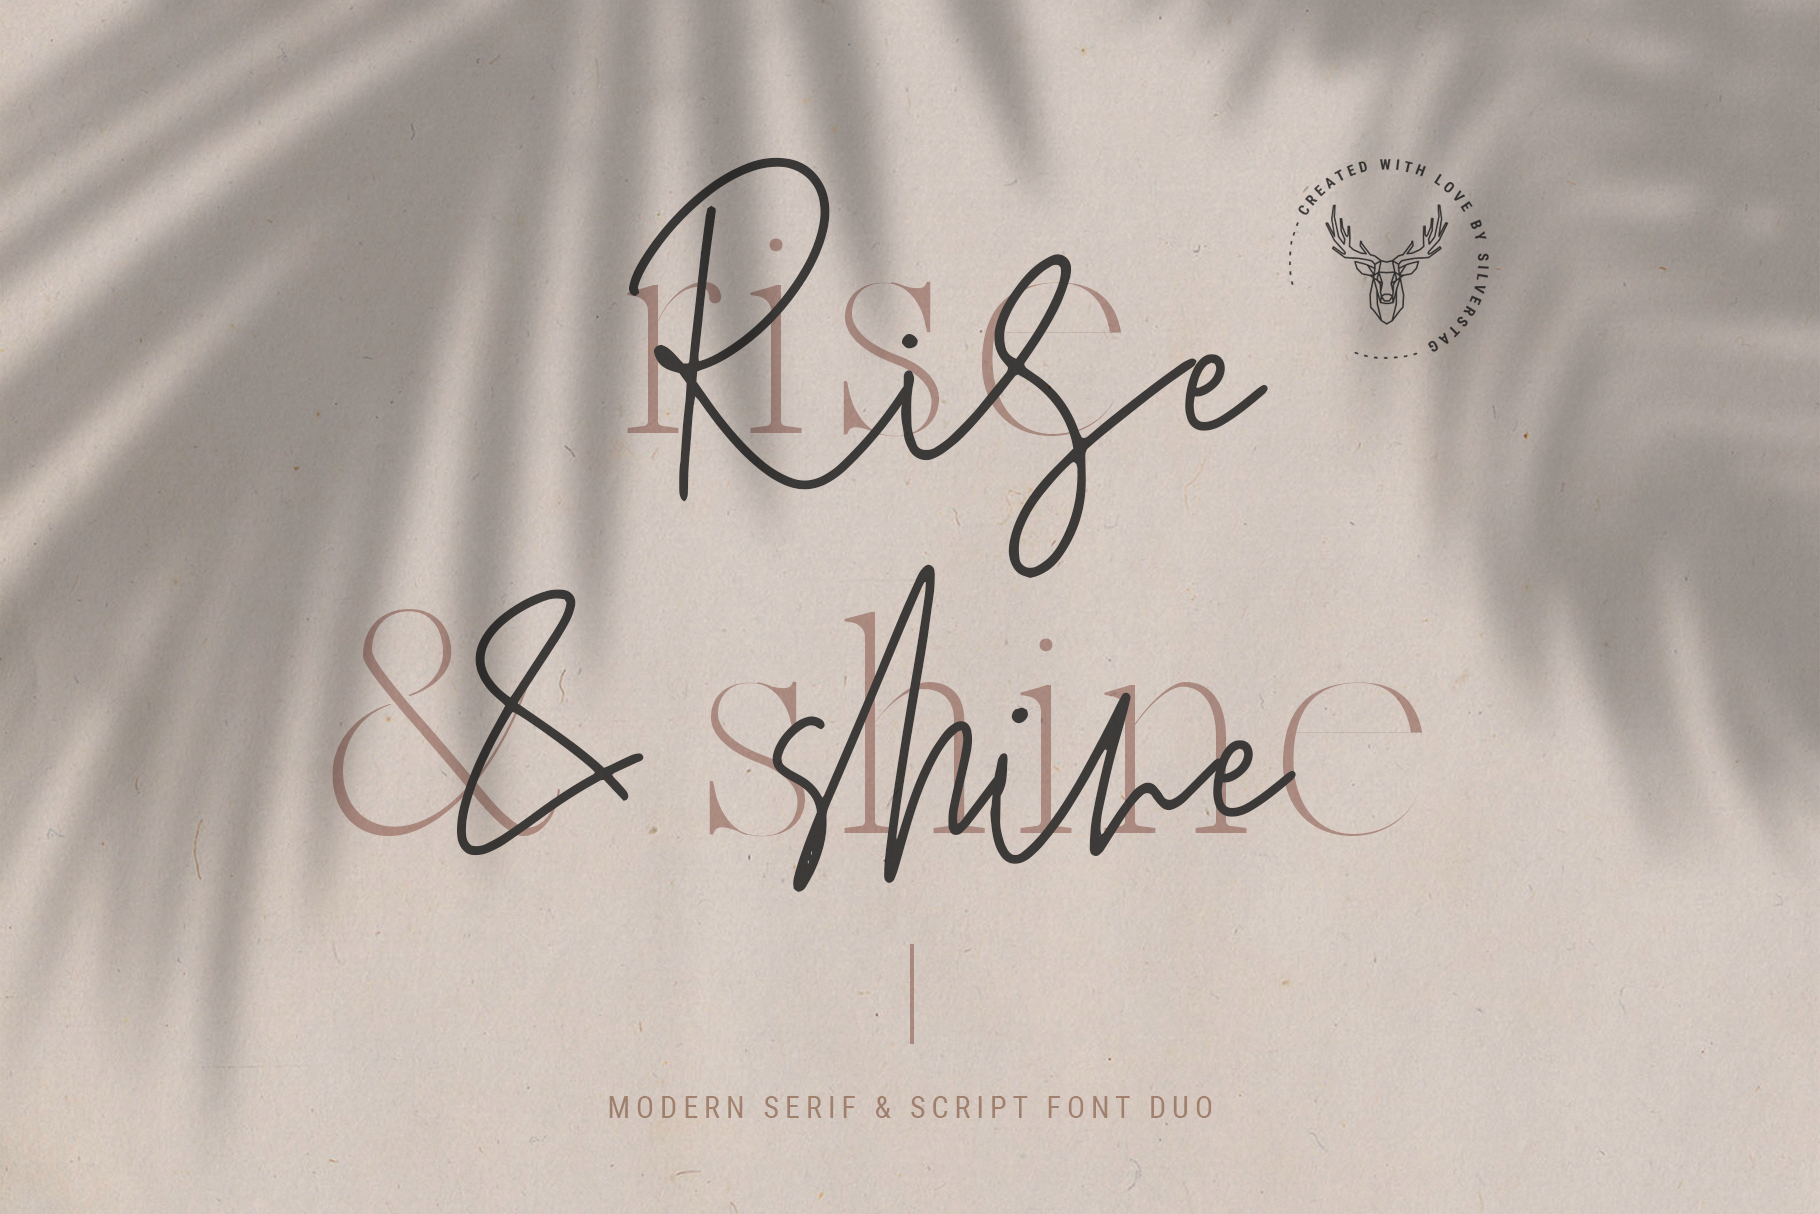 Marseille & Amsterdam - Modern Serif & Signature Font Duo example image 3